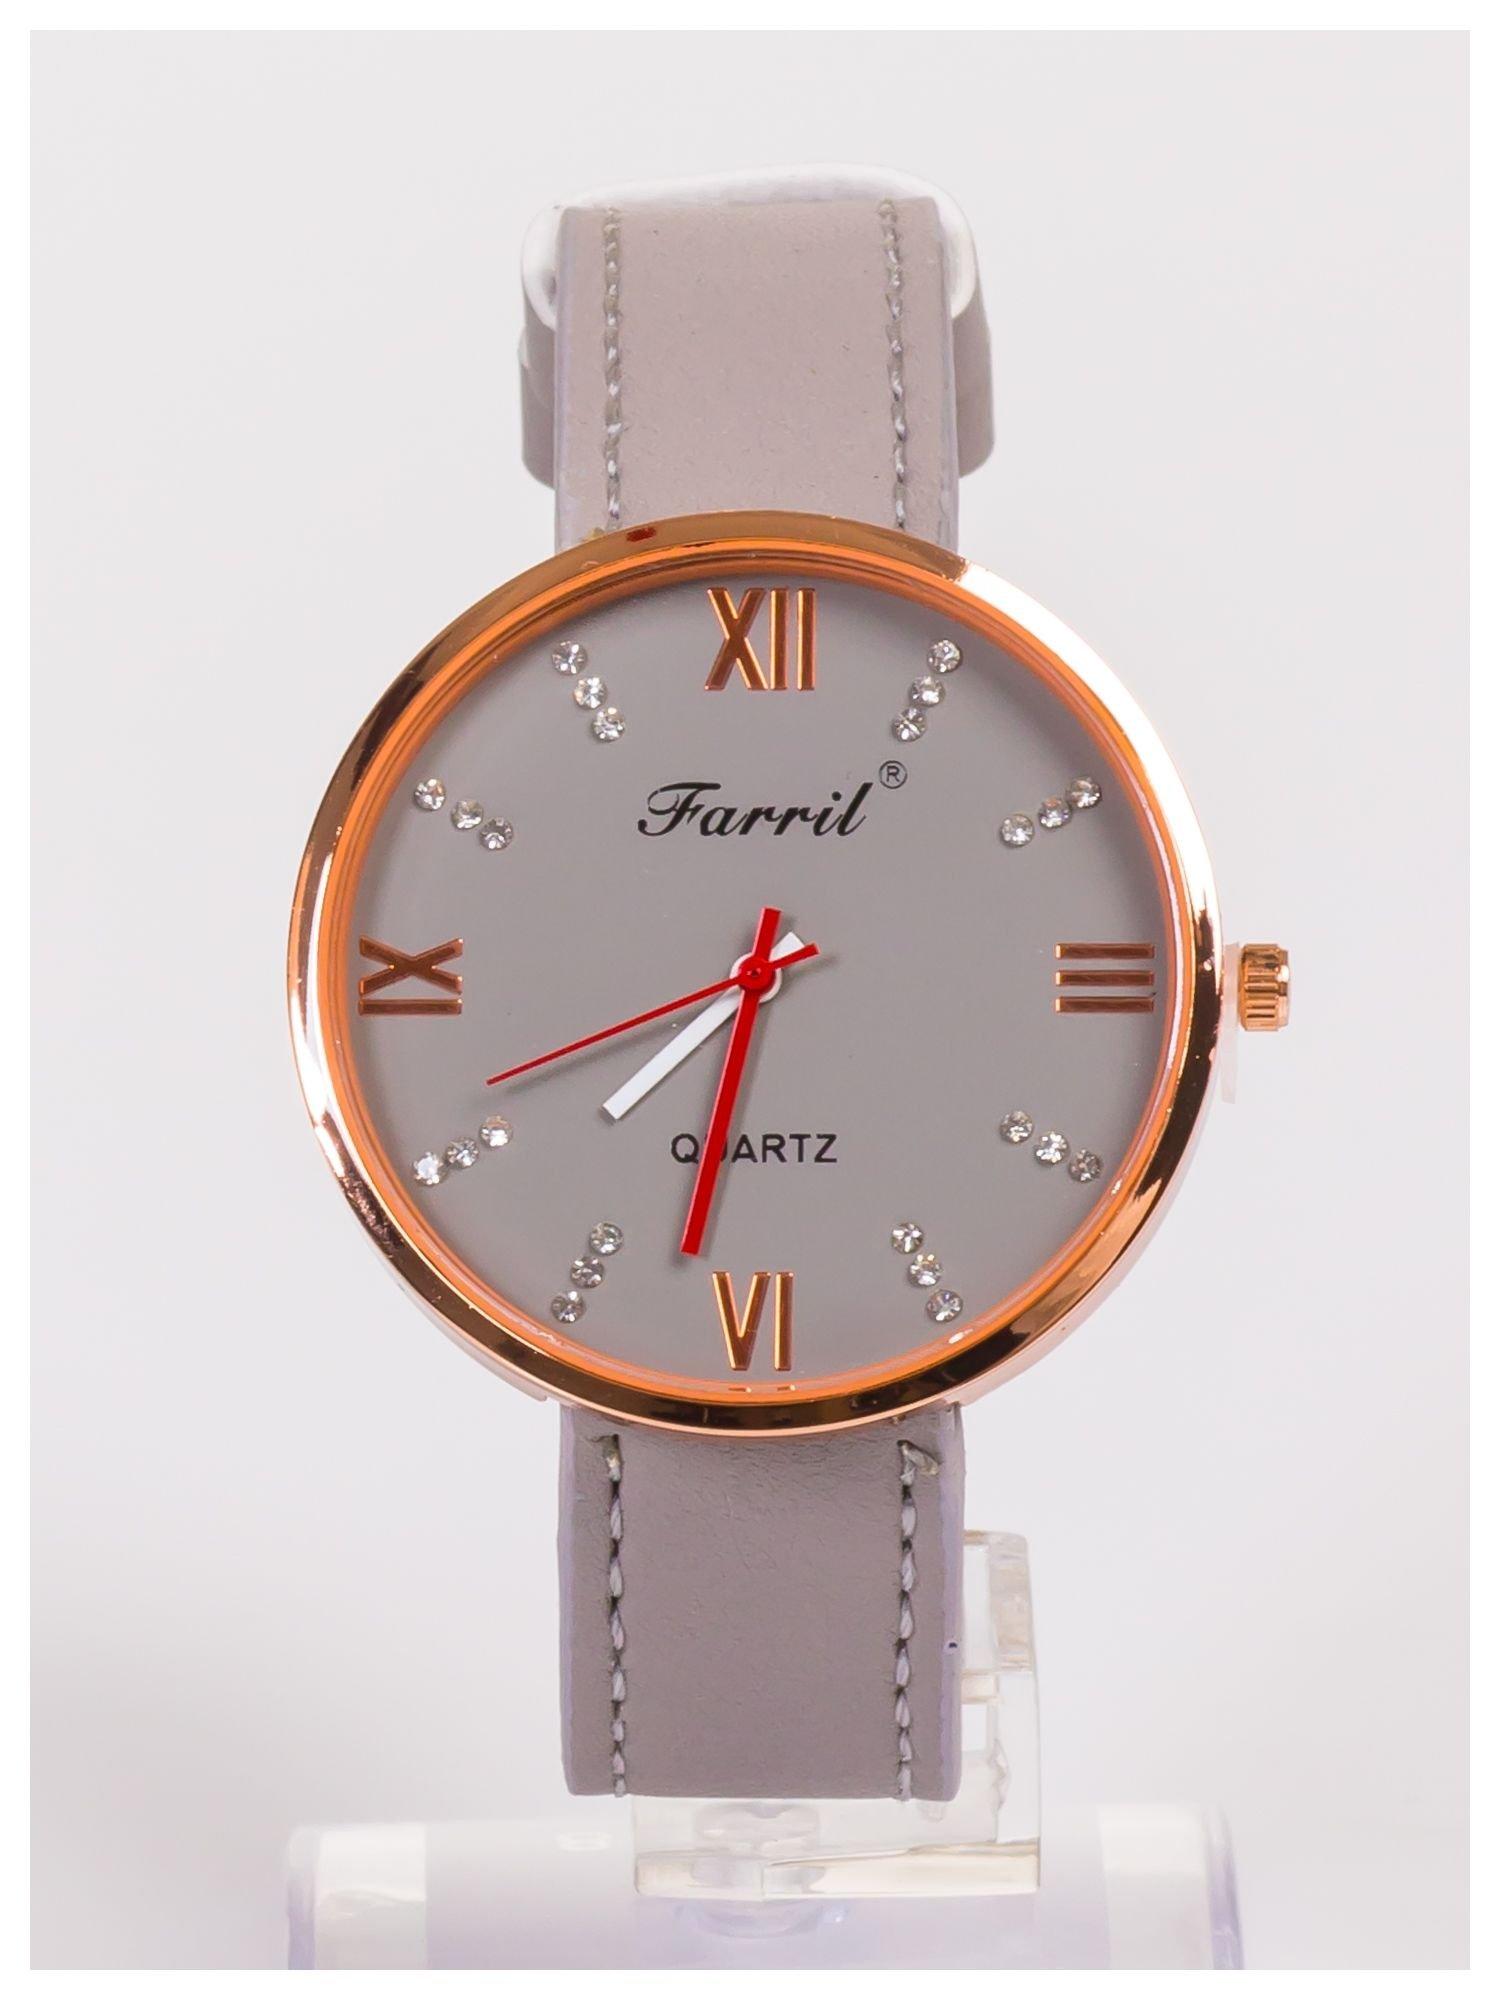 Farril -Klasyka i elegancja szary damski zegarek retro z cyrkoniami -Rose gold                                  zdj.                                  1